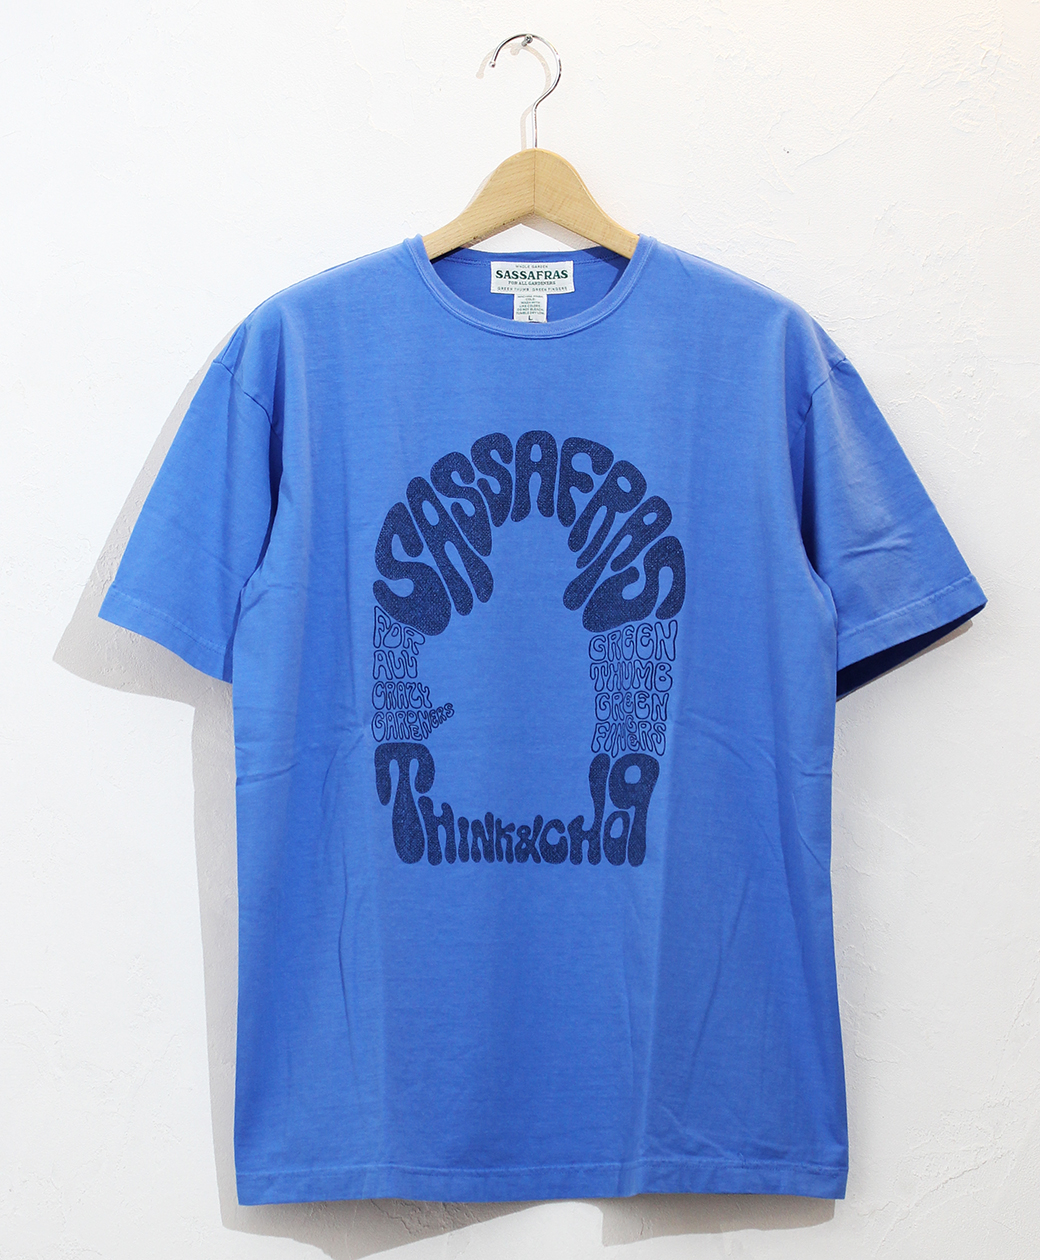 SASSAFRAS T&C Unsccooppam T(Sax Pigment)